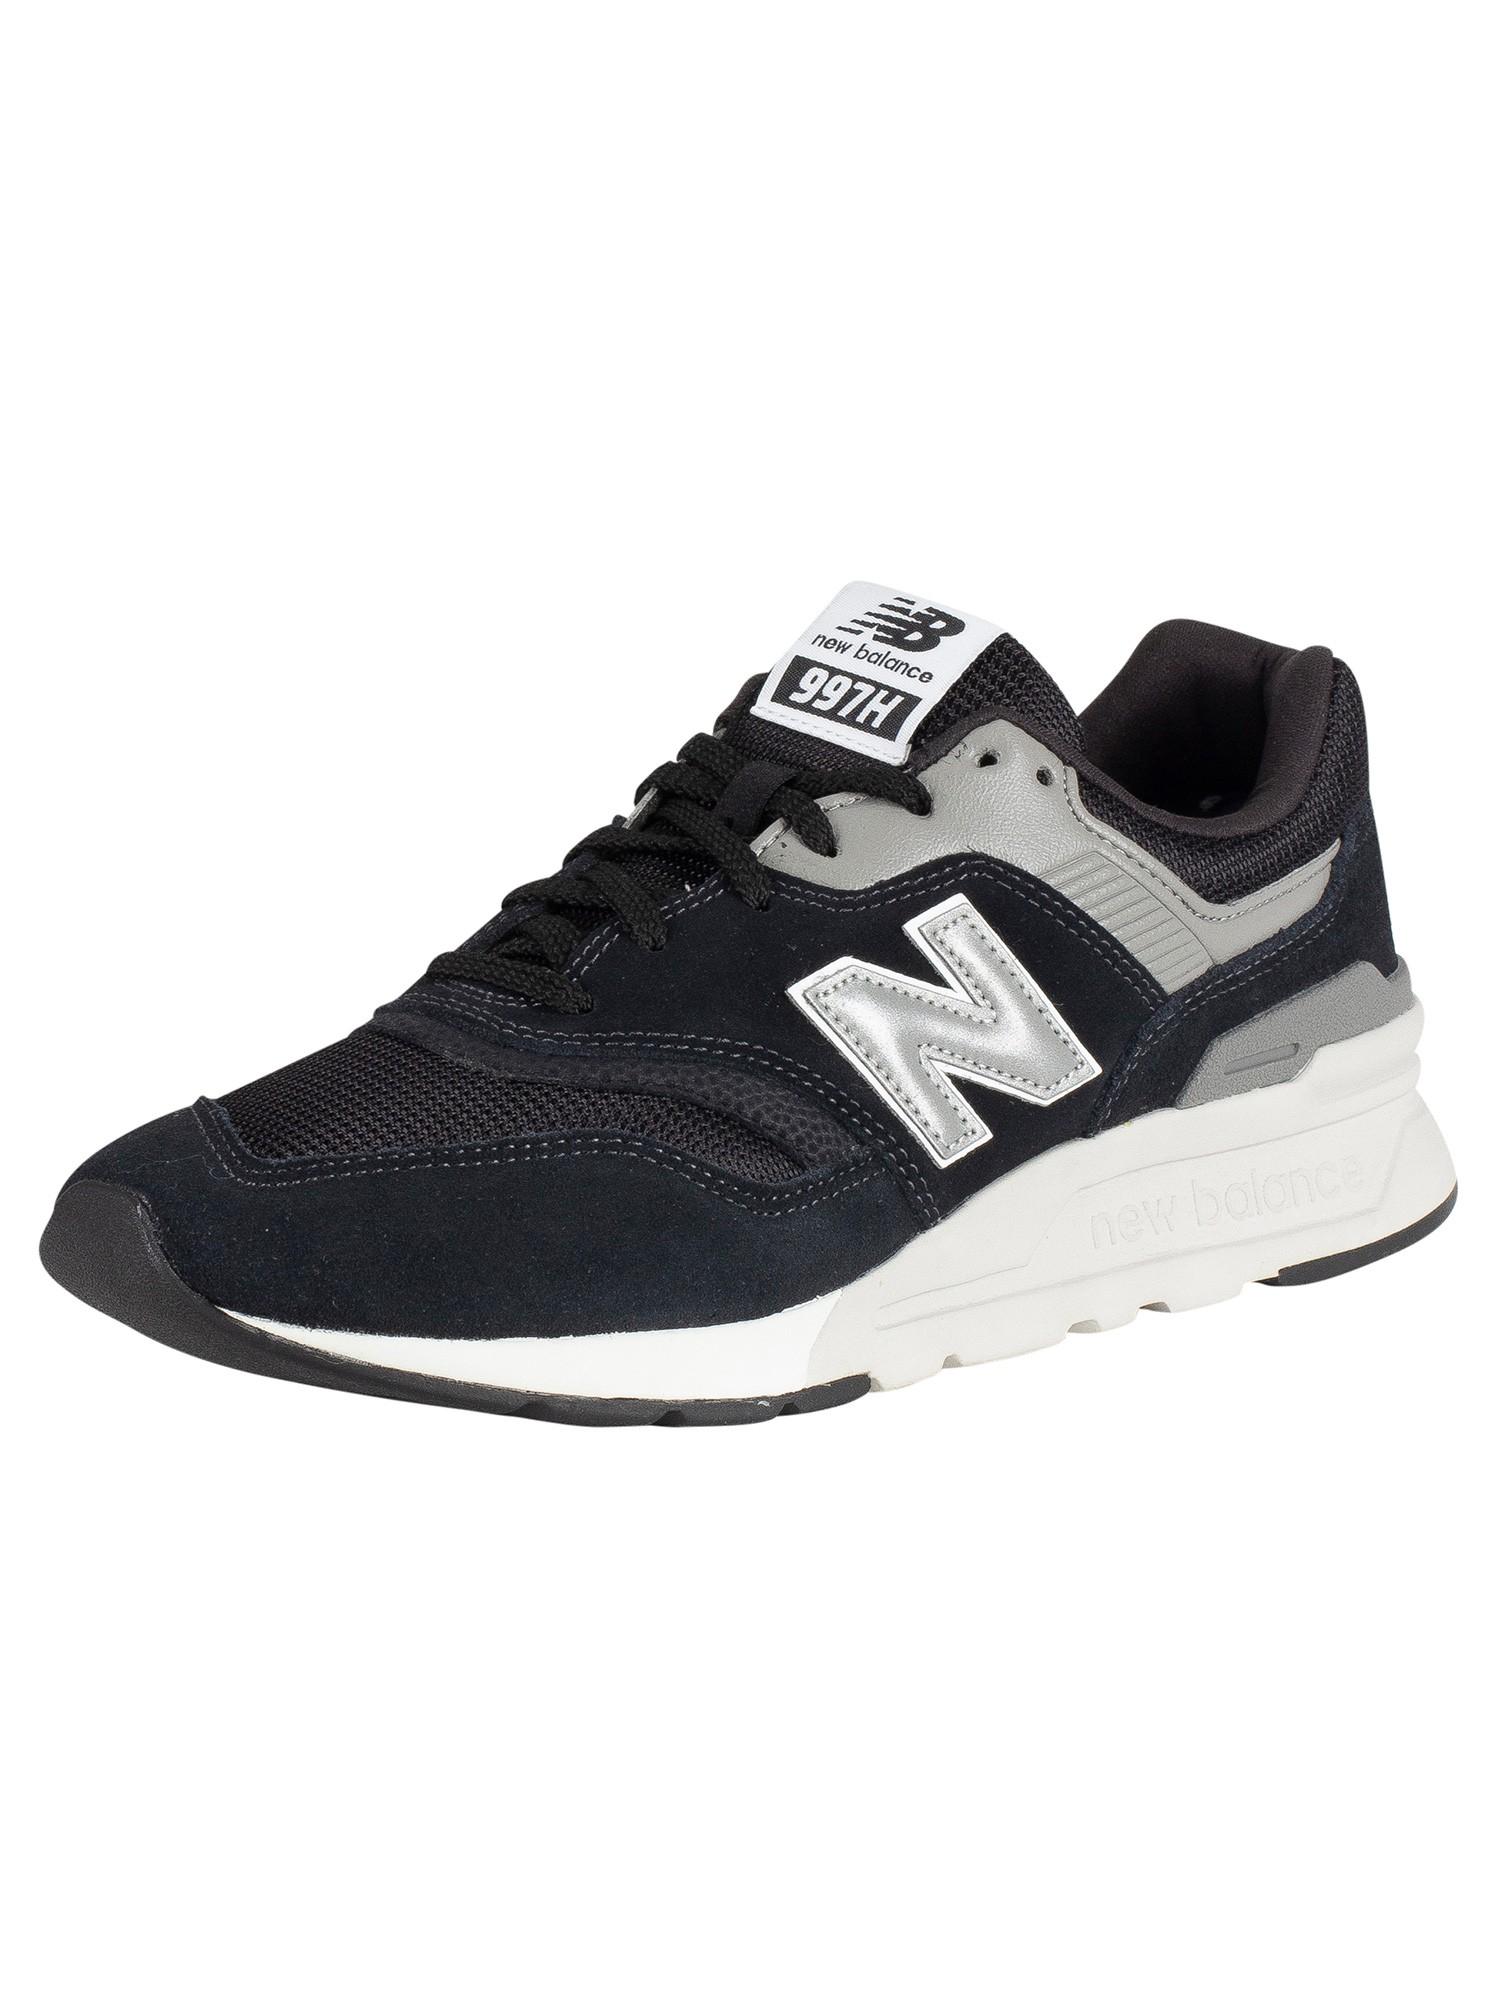 b3c74205f7a70 New Balance | New Balance Men's Footwear | Standout